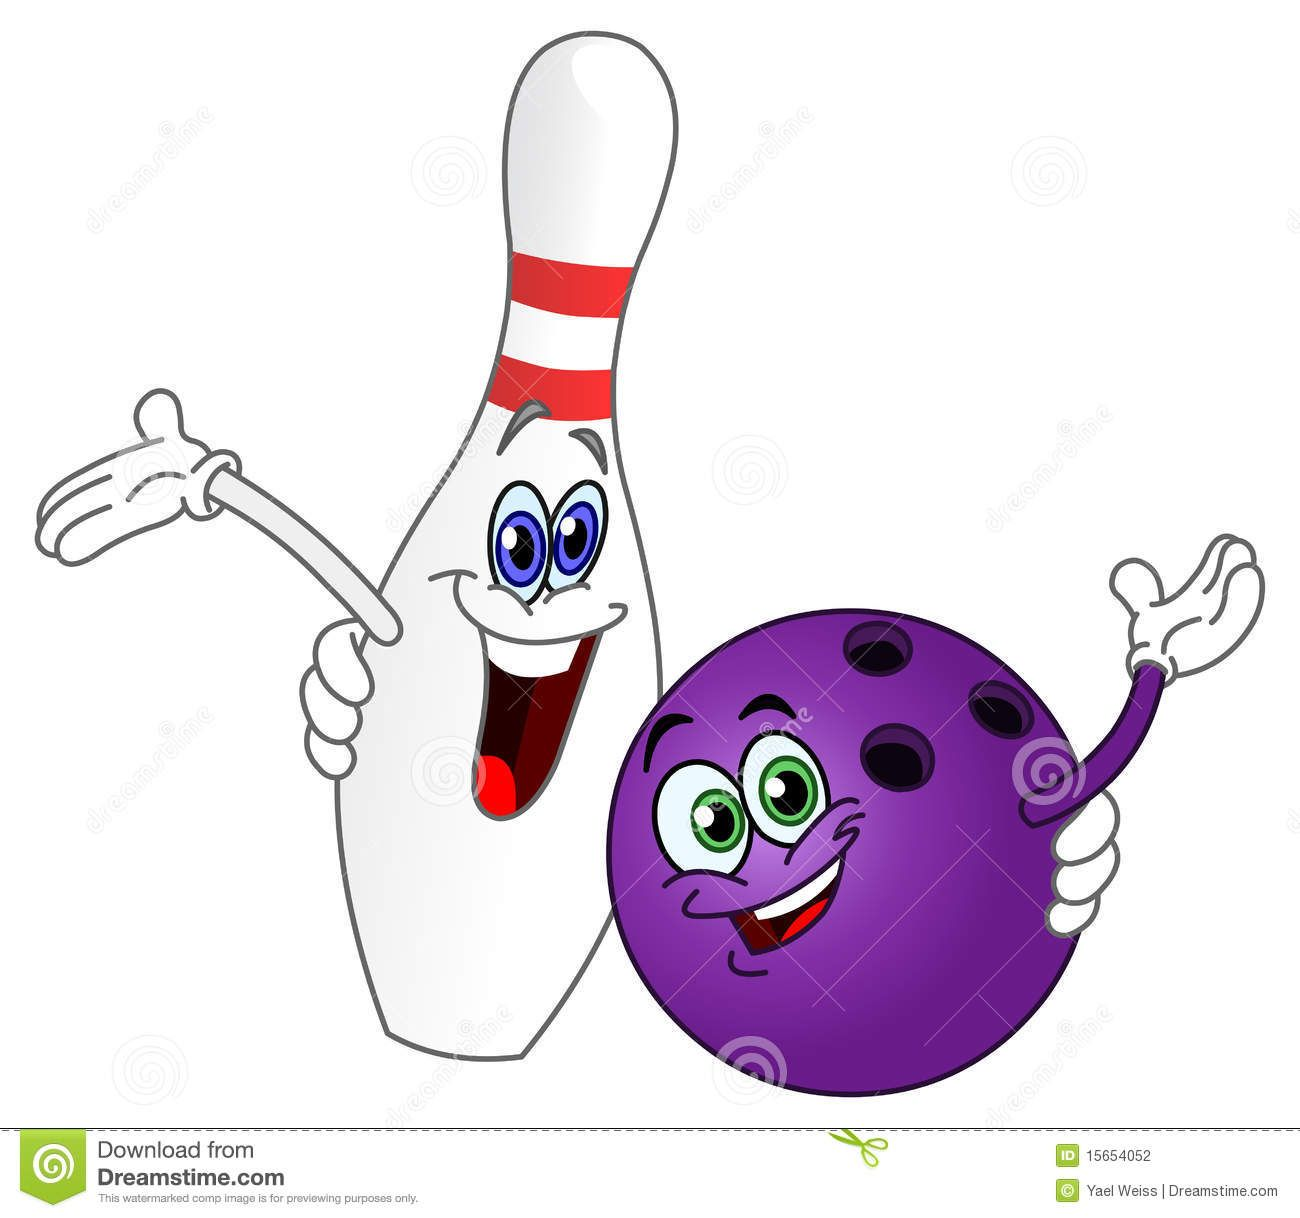 Clip art bing images. Bowling clipart cute